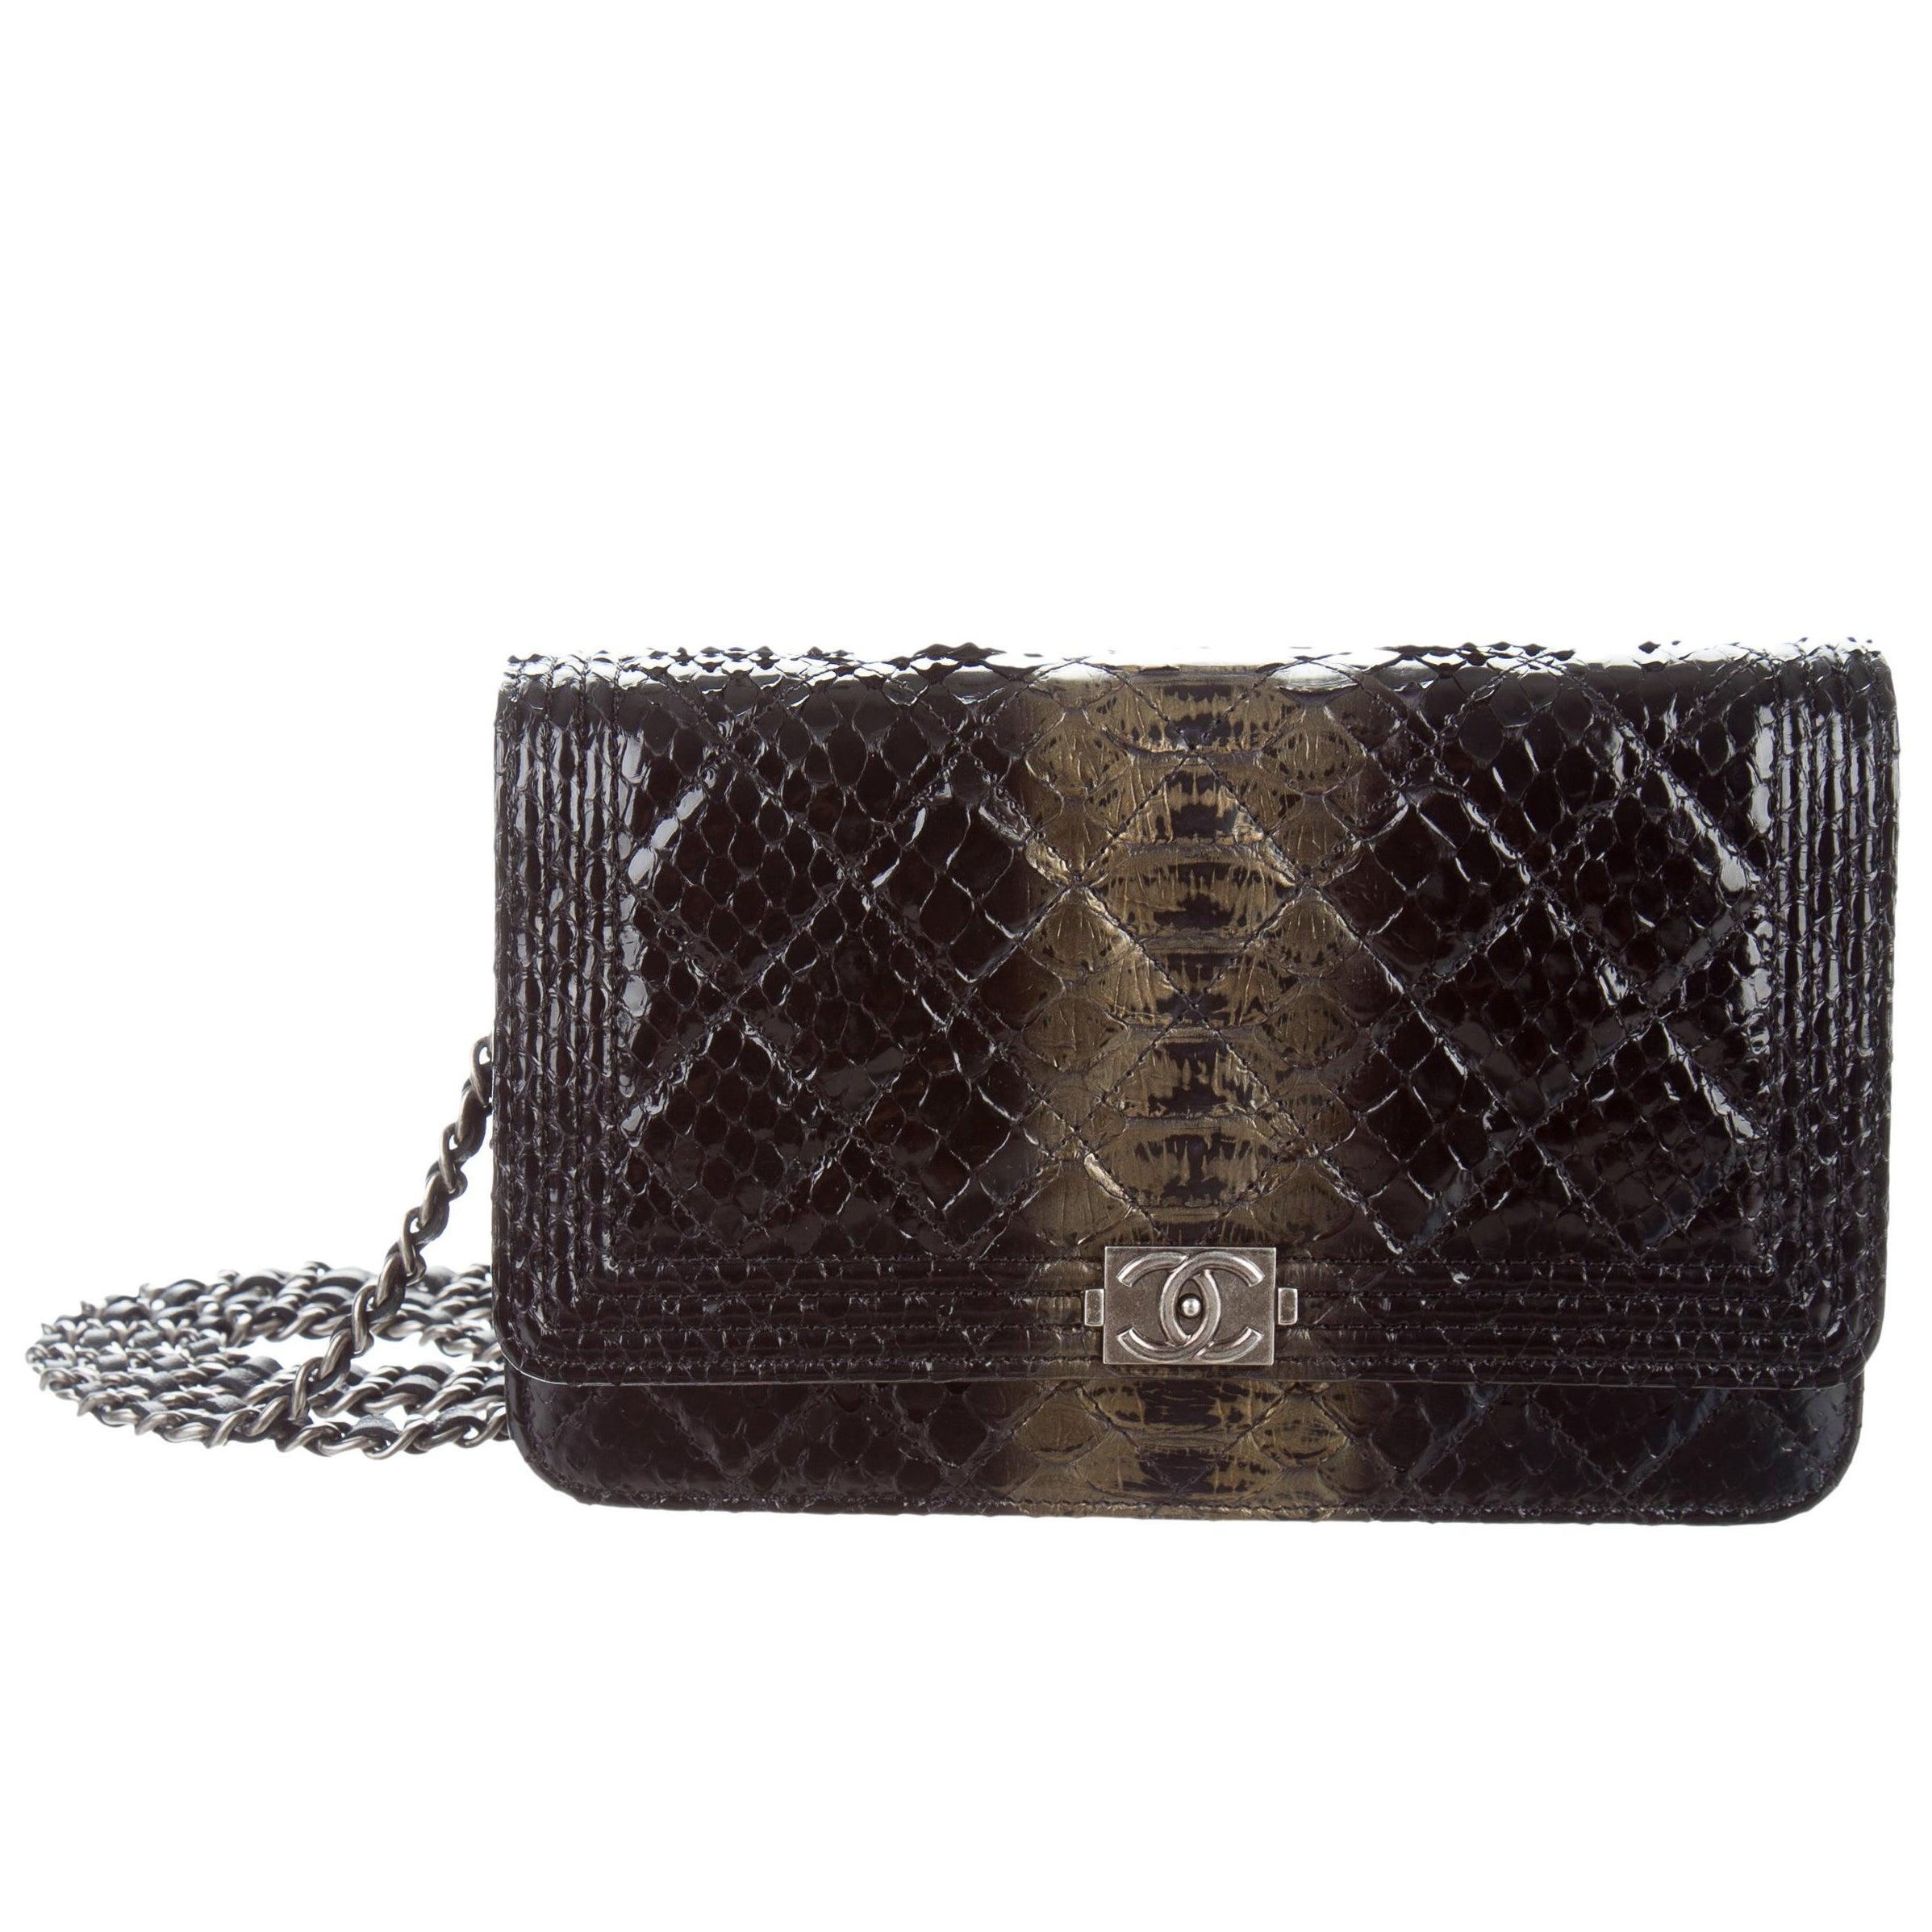 eabe7e2d580b Chanel Like New Black Gold Python Exotic Leather WOC Shoulder Flap Bag For  Sale at 1stdibs